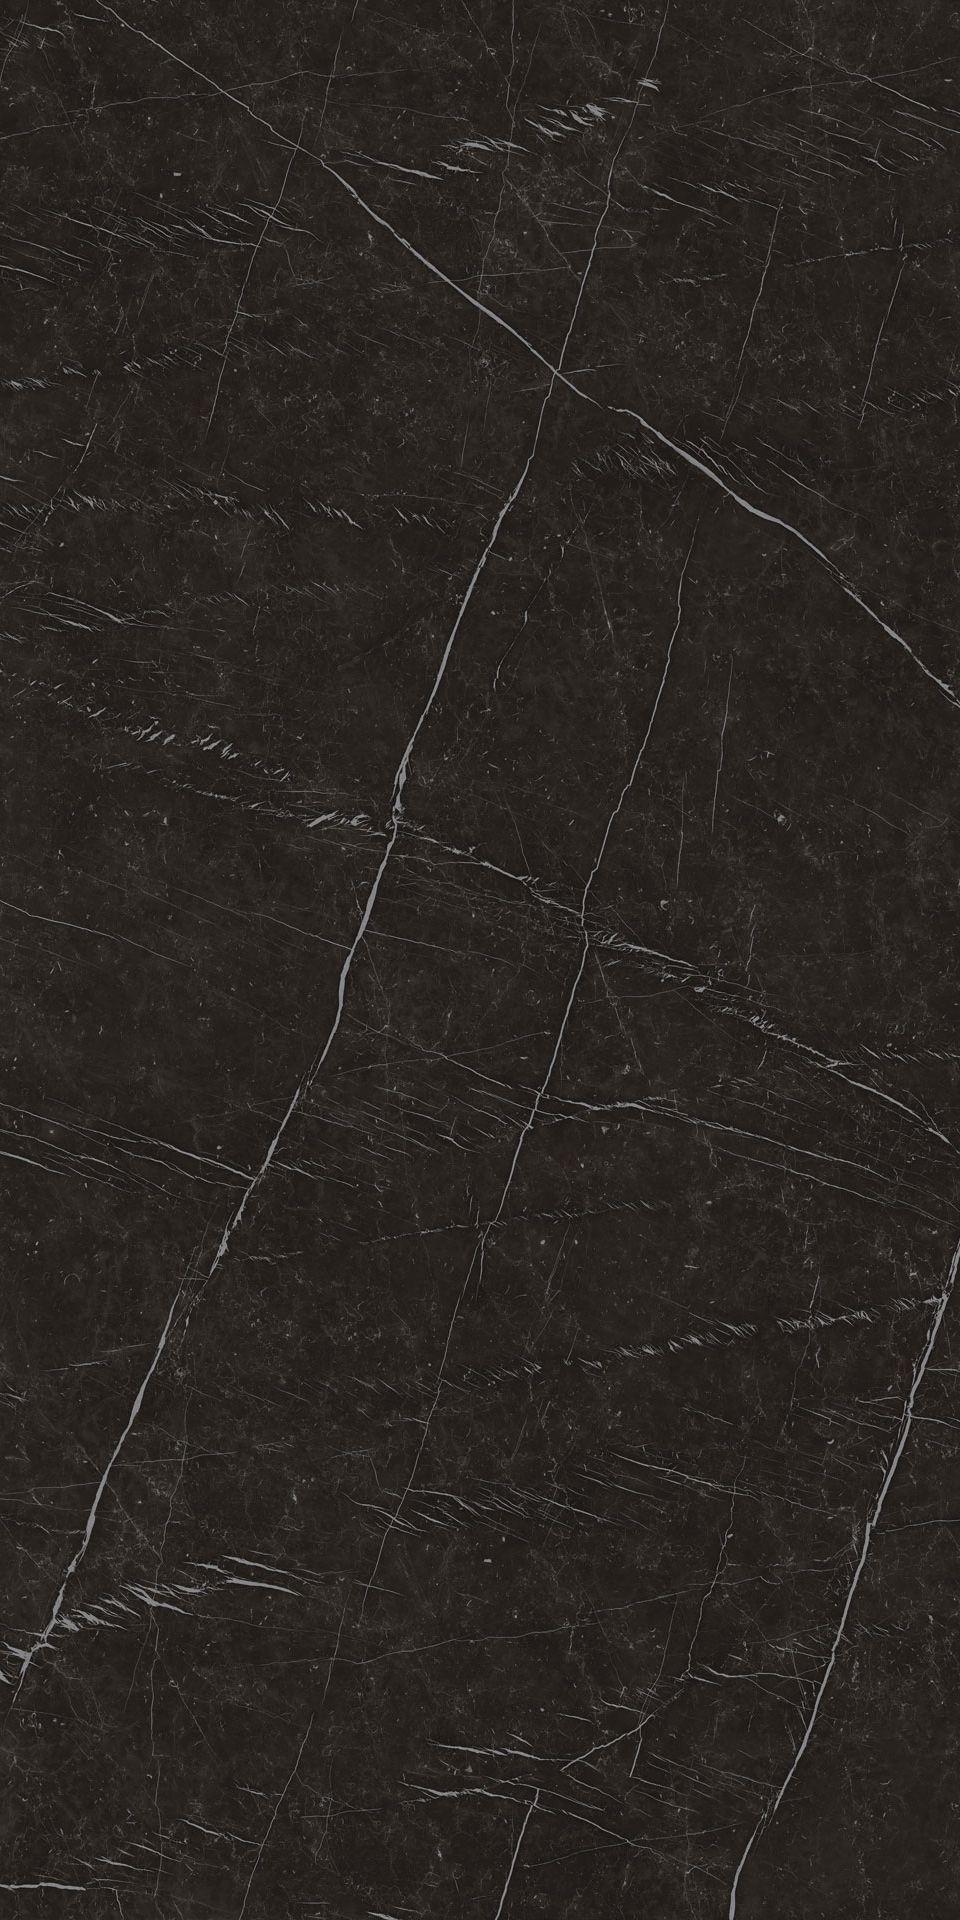 Black Marble Texture Seamless : black, marble, texture, seamless, Marquina, Atlas, Texture, Seamless,, Stone, Texture,, Marble